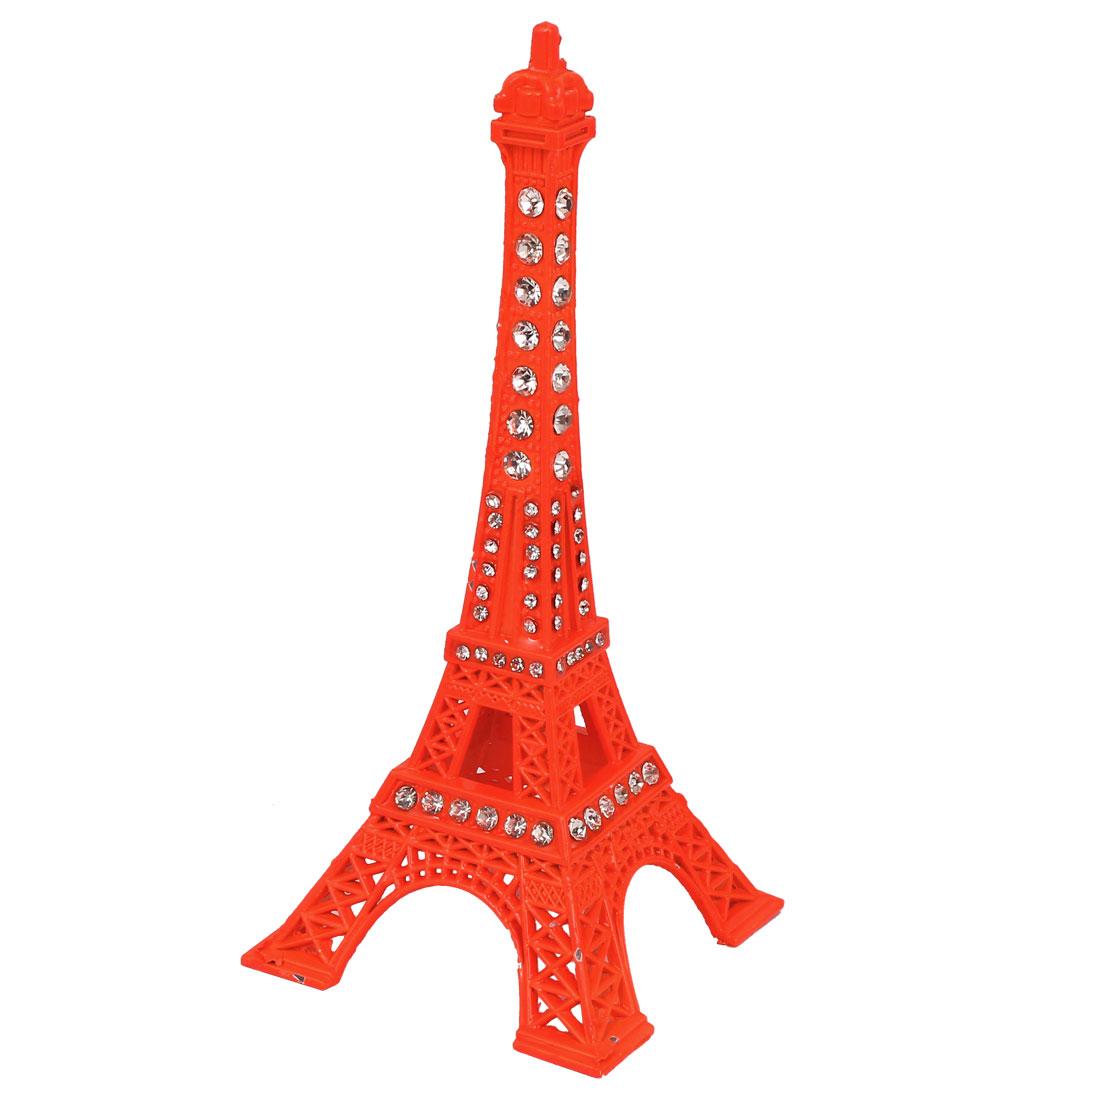 Metal France Miniature Building Rhinestone Inlaid Eiffel Tower Model Living Ornament Orange